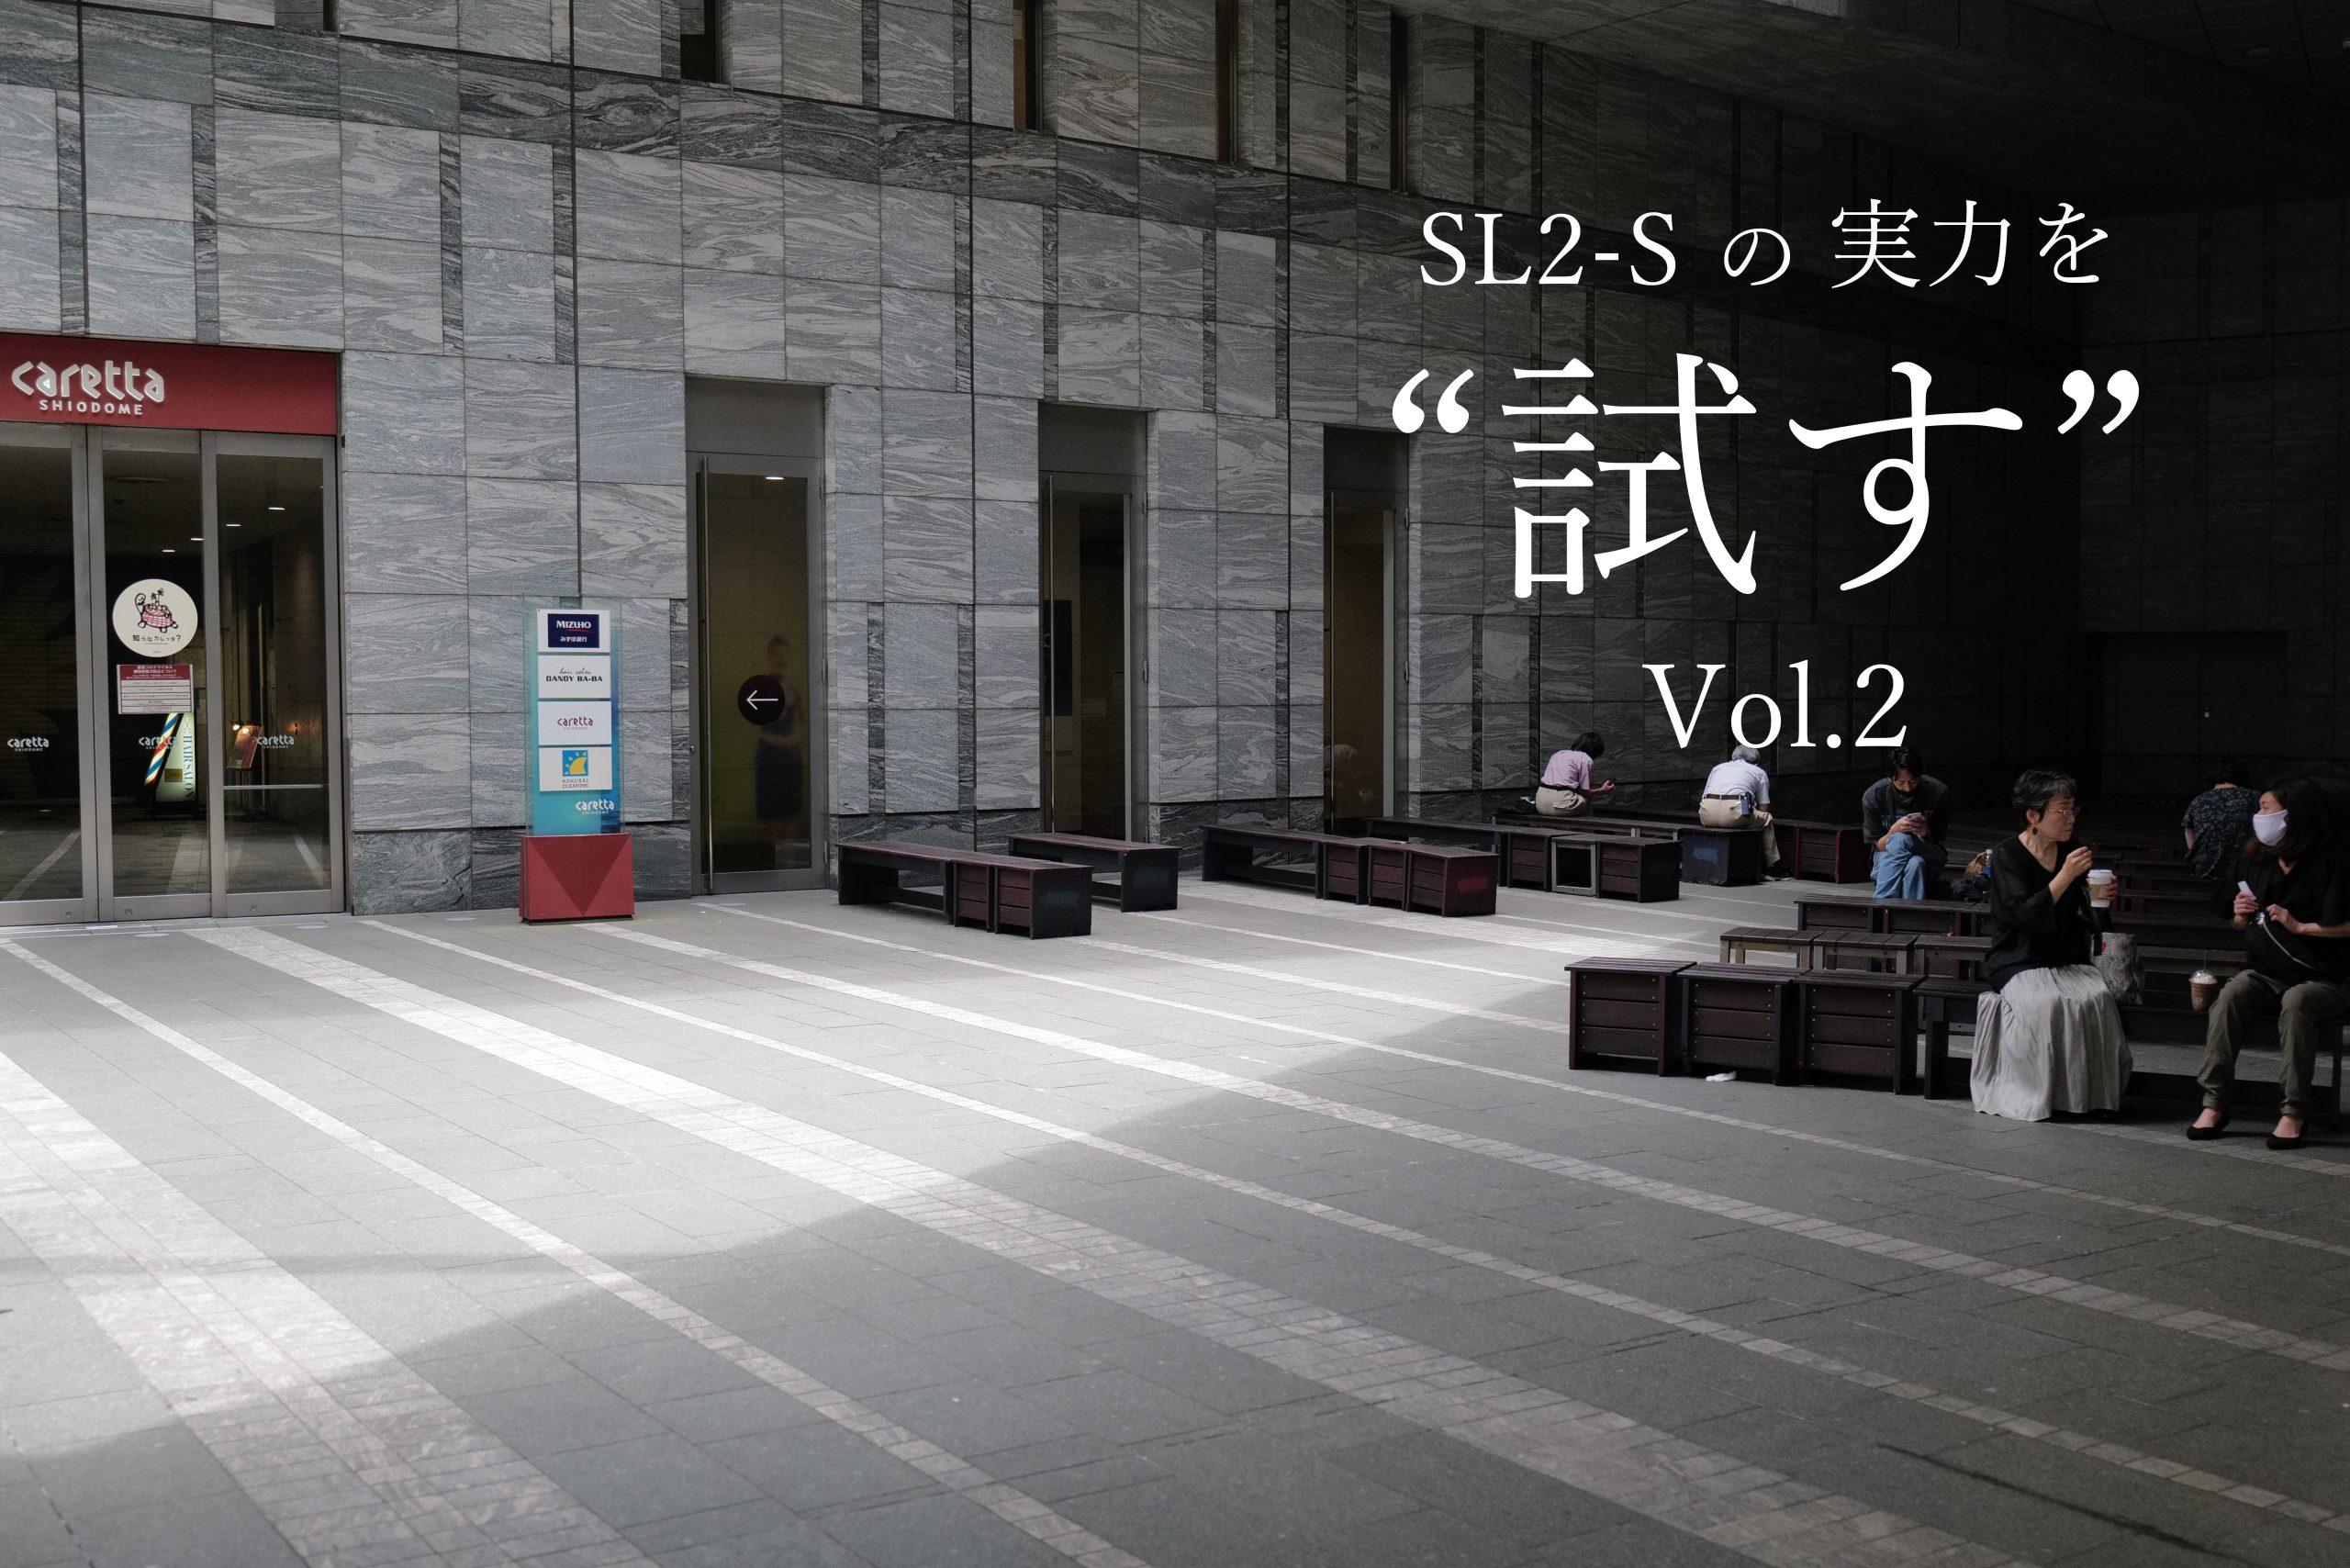 【Leica】SL2-Sの動画画質/記録形式による違いを比較してみる